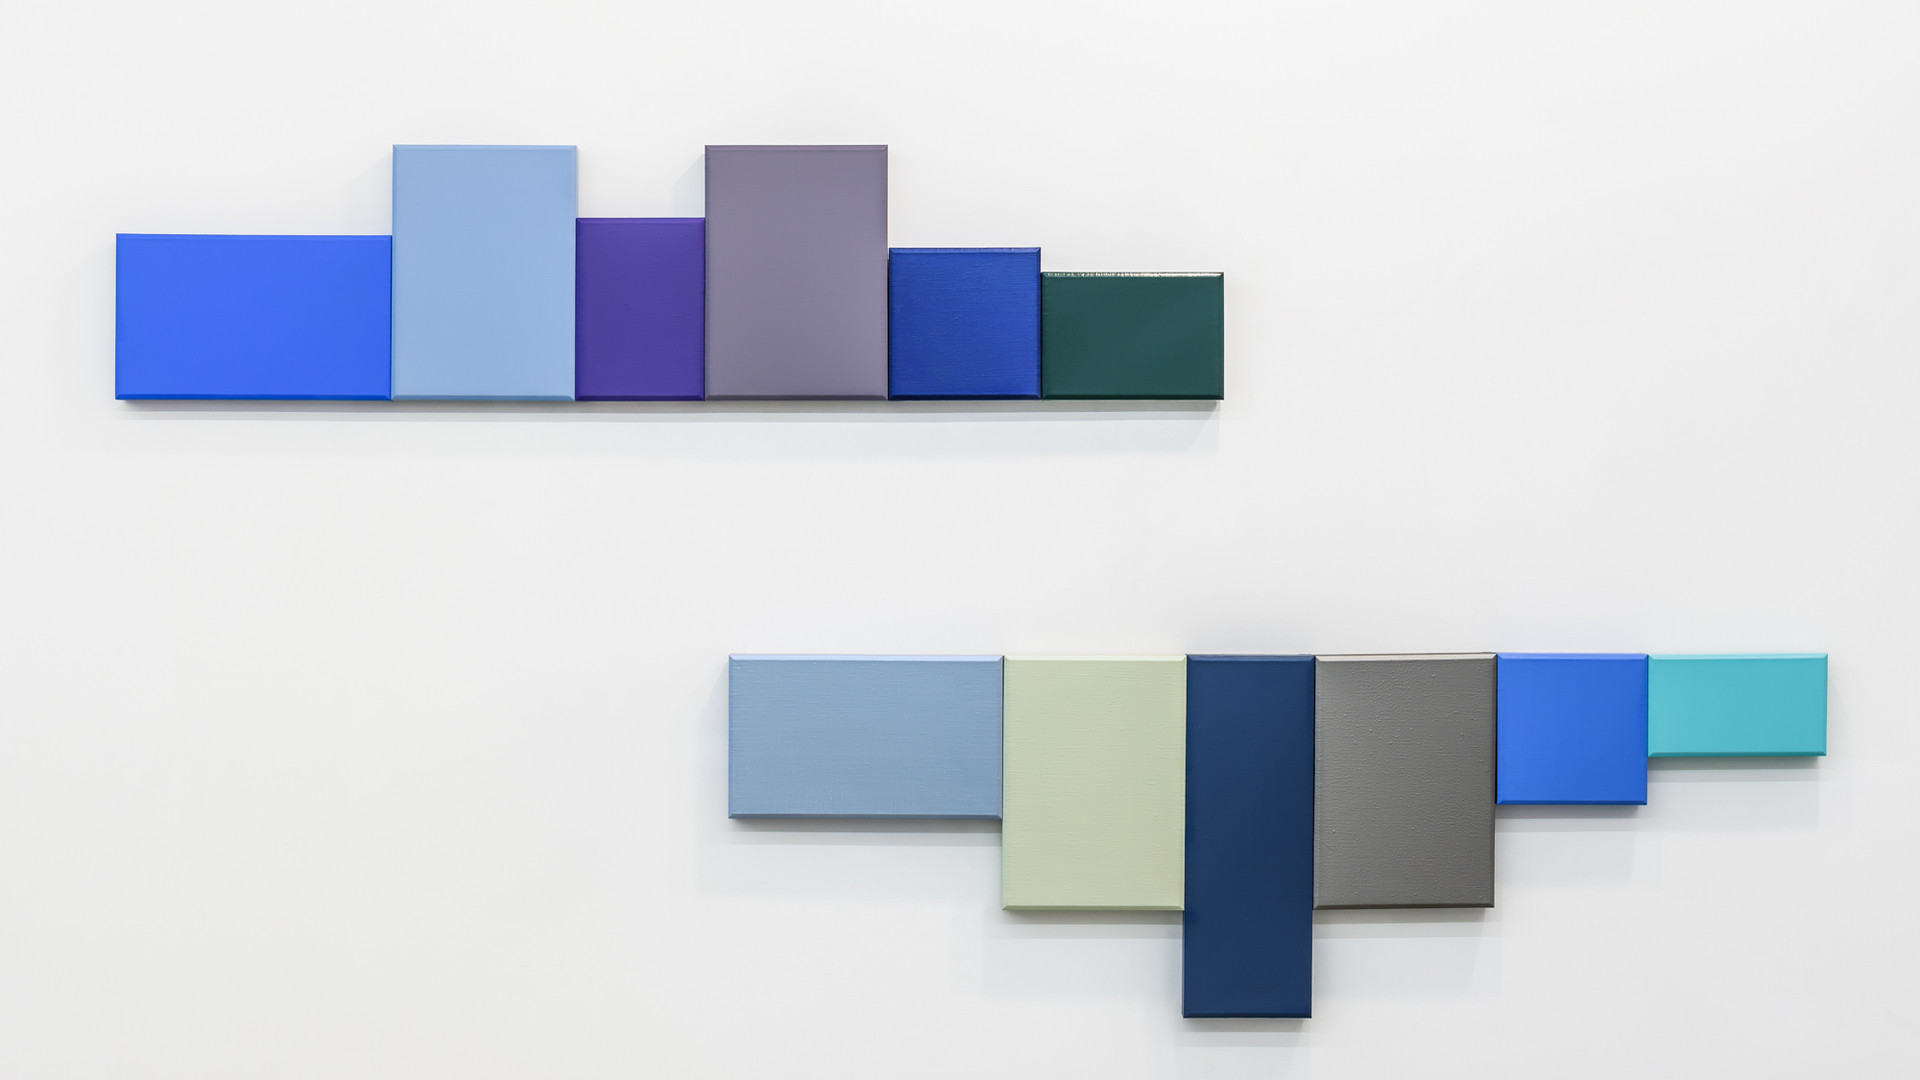 Chiaksan, 2016, acrylic on canvas, 182 x 42 x 5 cm (above), 182 x 60 x 5 cm (bottom)